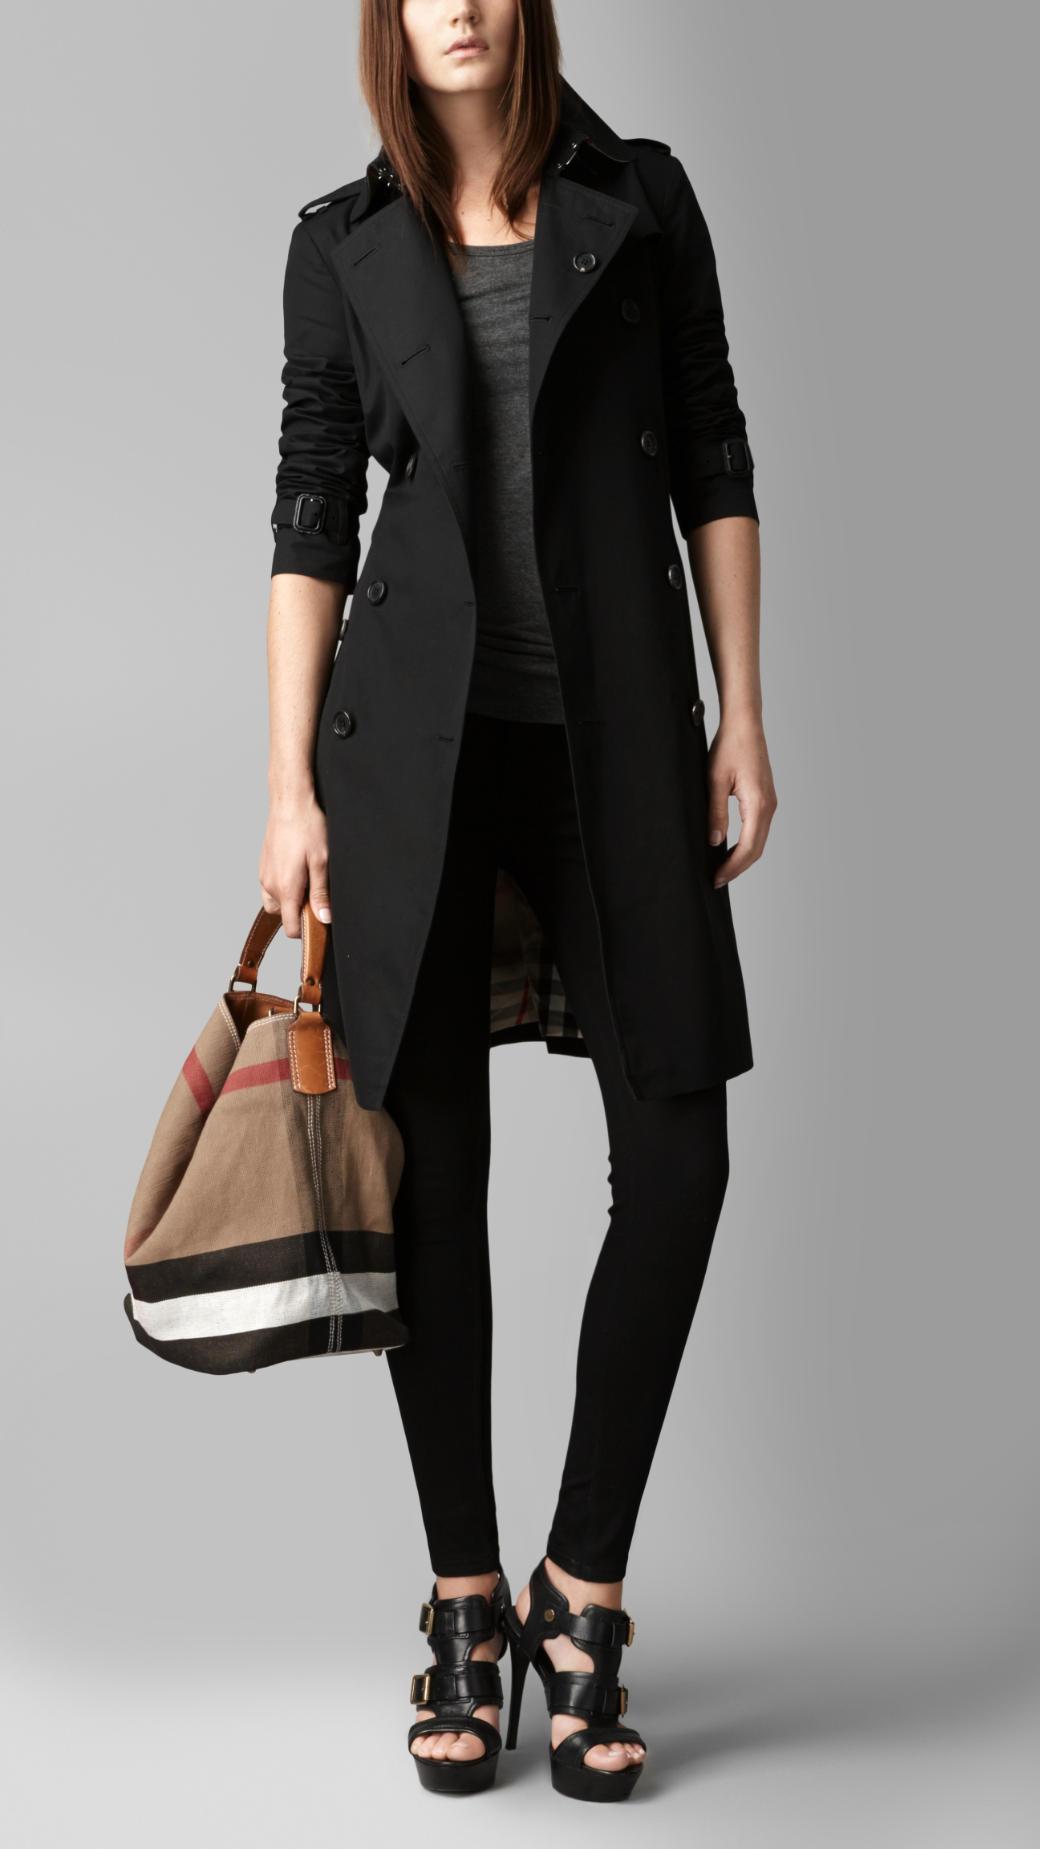 Snap Lyst Burberry Medium Leather Chevron Canvas Check Hobo Bag ... 31b47122804f4